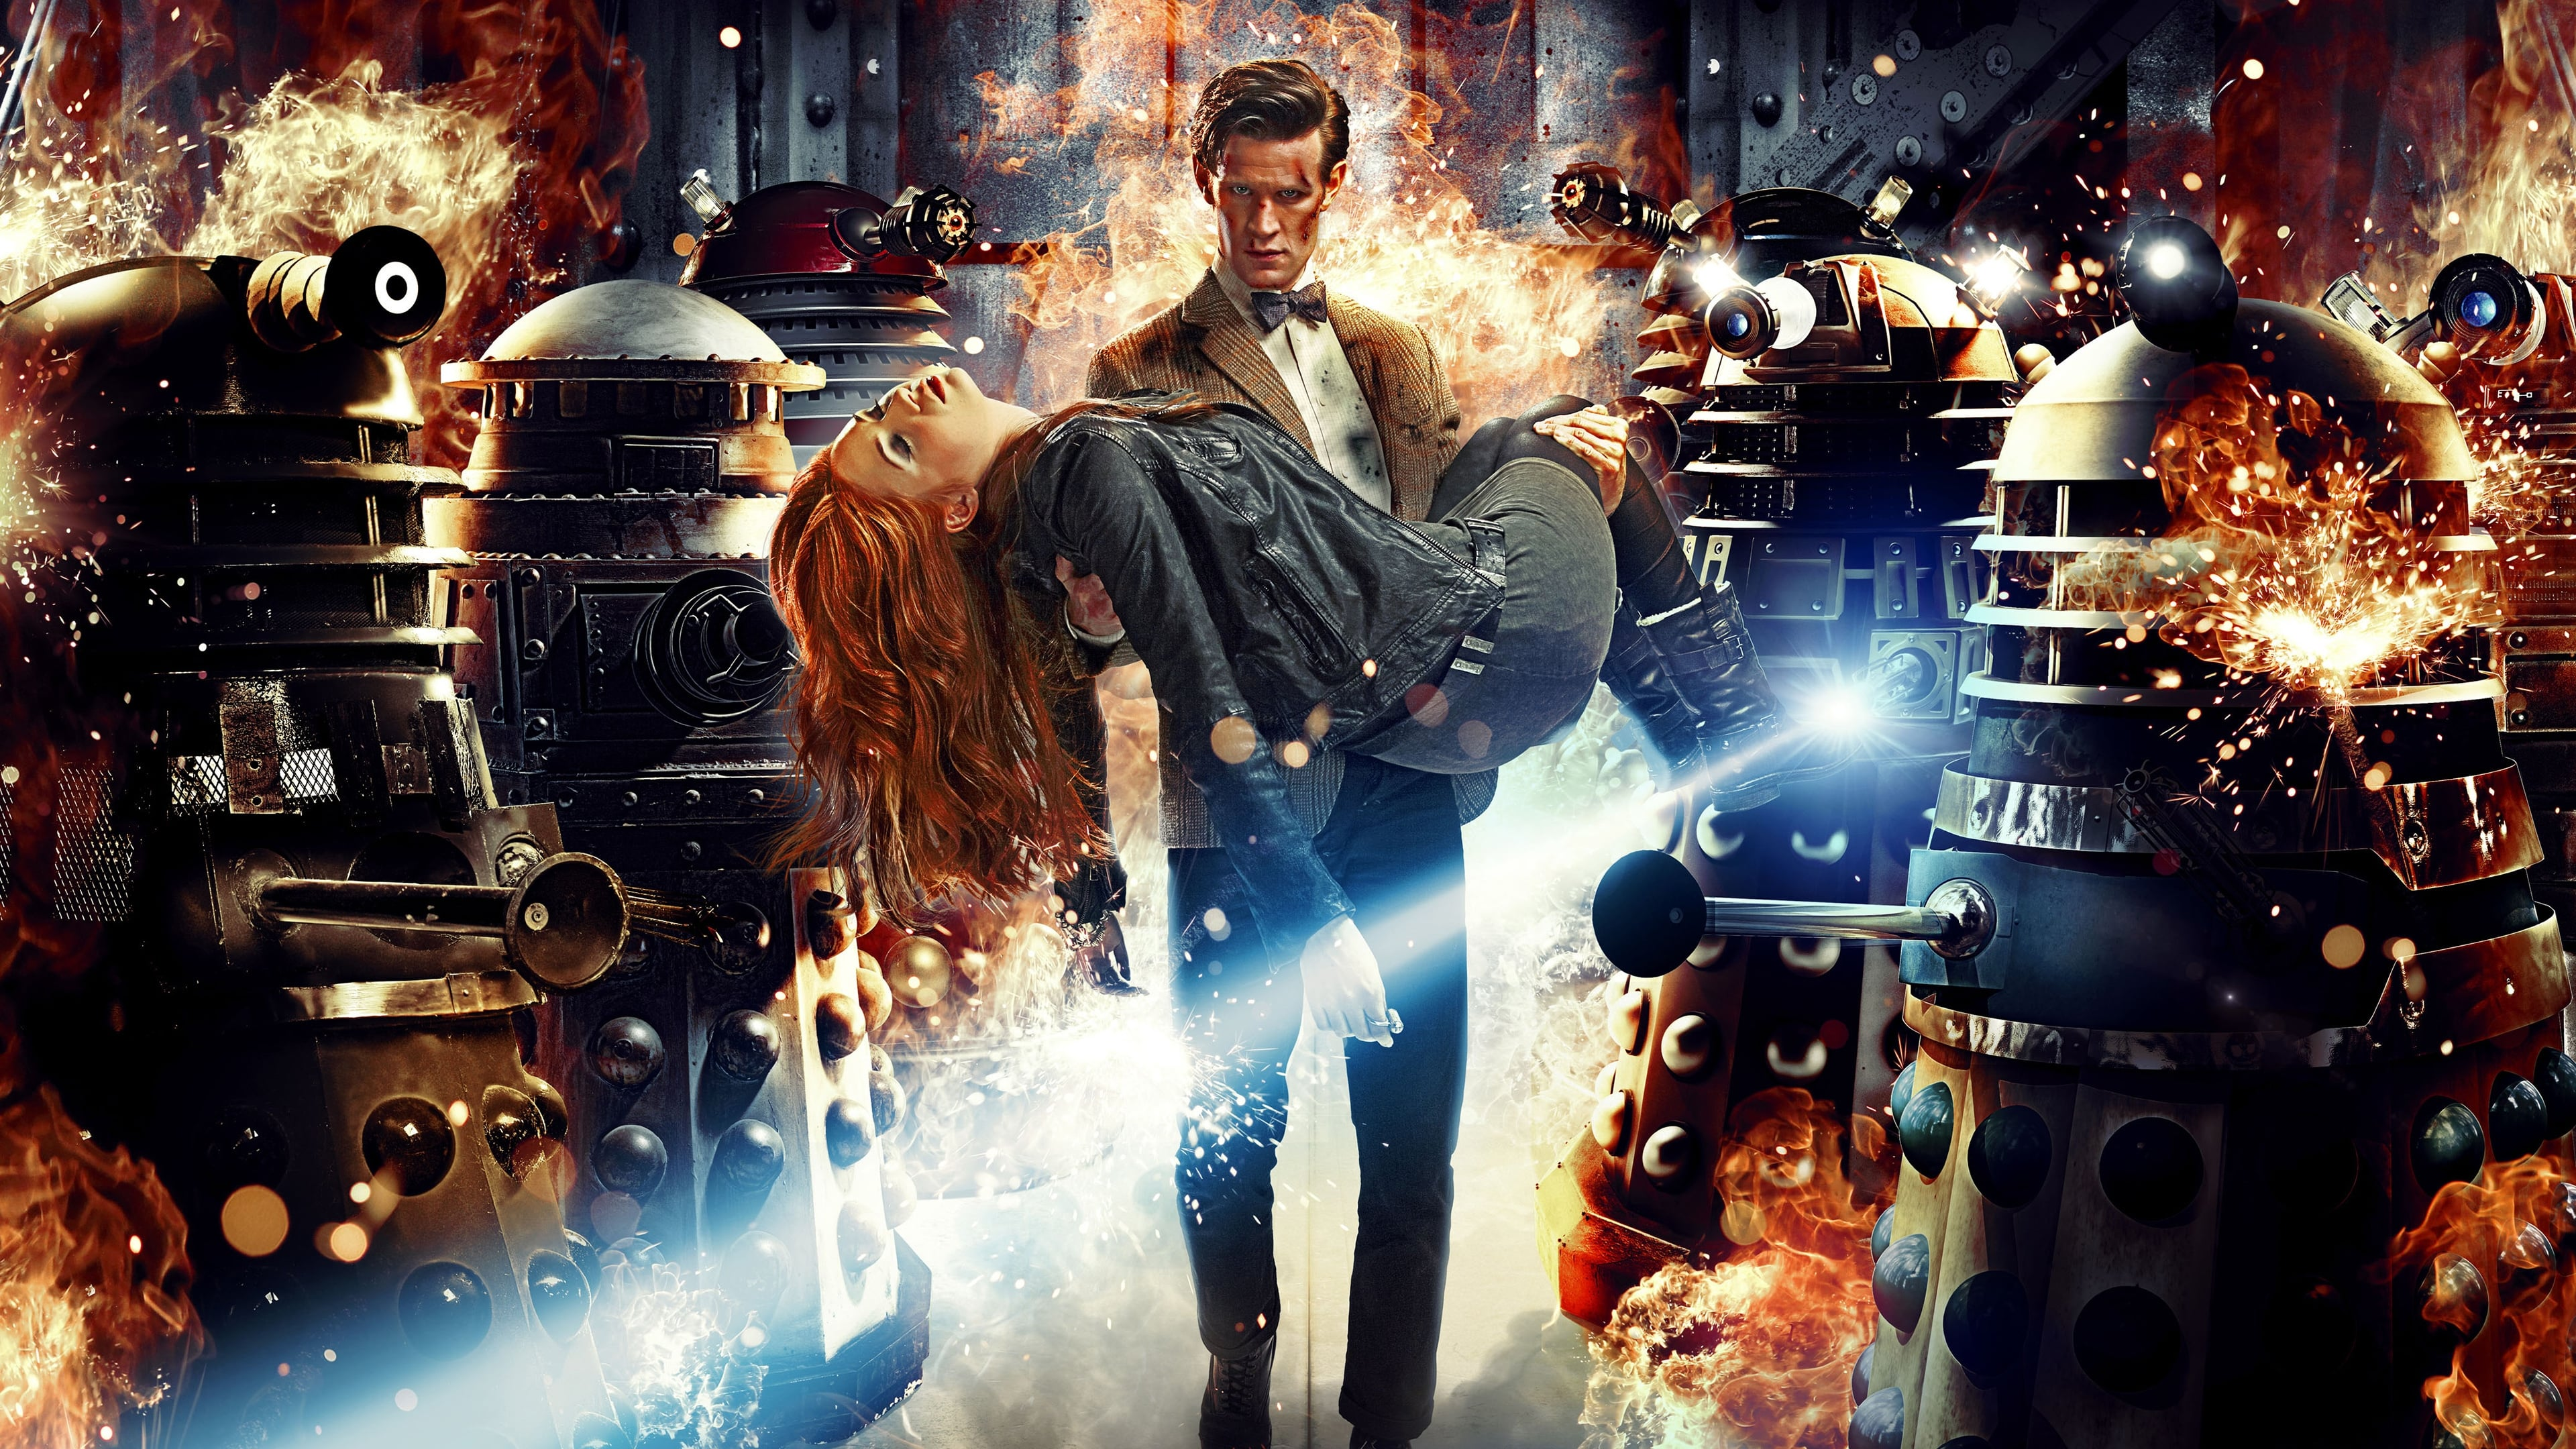 Doctor Who Season 7 :Episode 1  Asylum of the Daleks